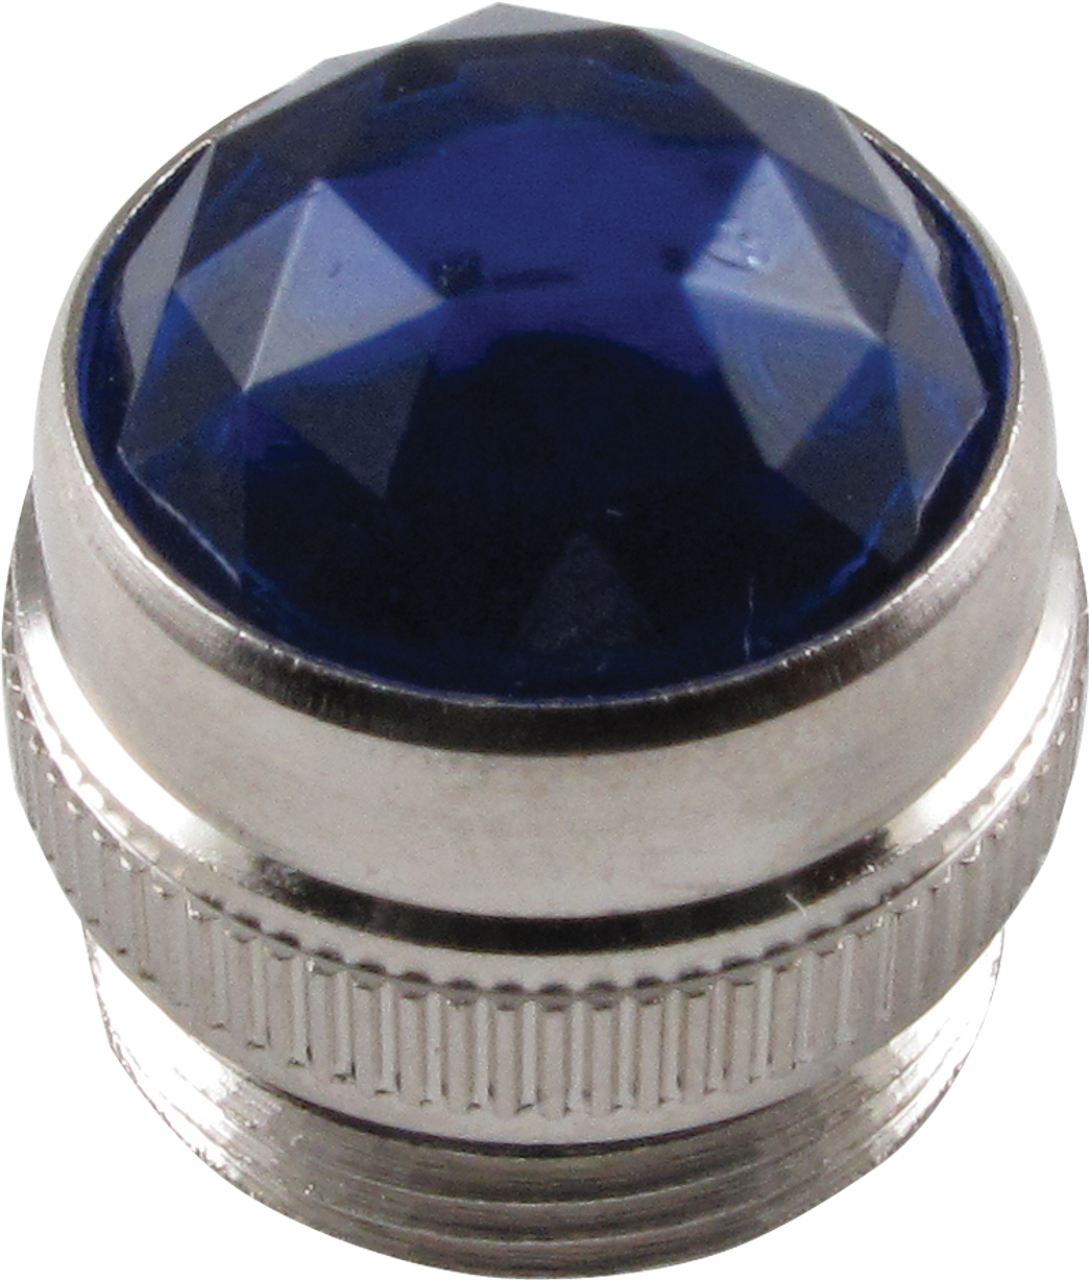 Amp Jewel - Fender Style Bright Blue